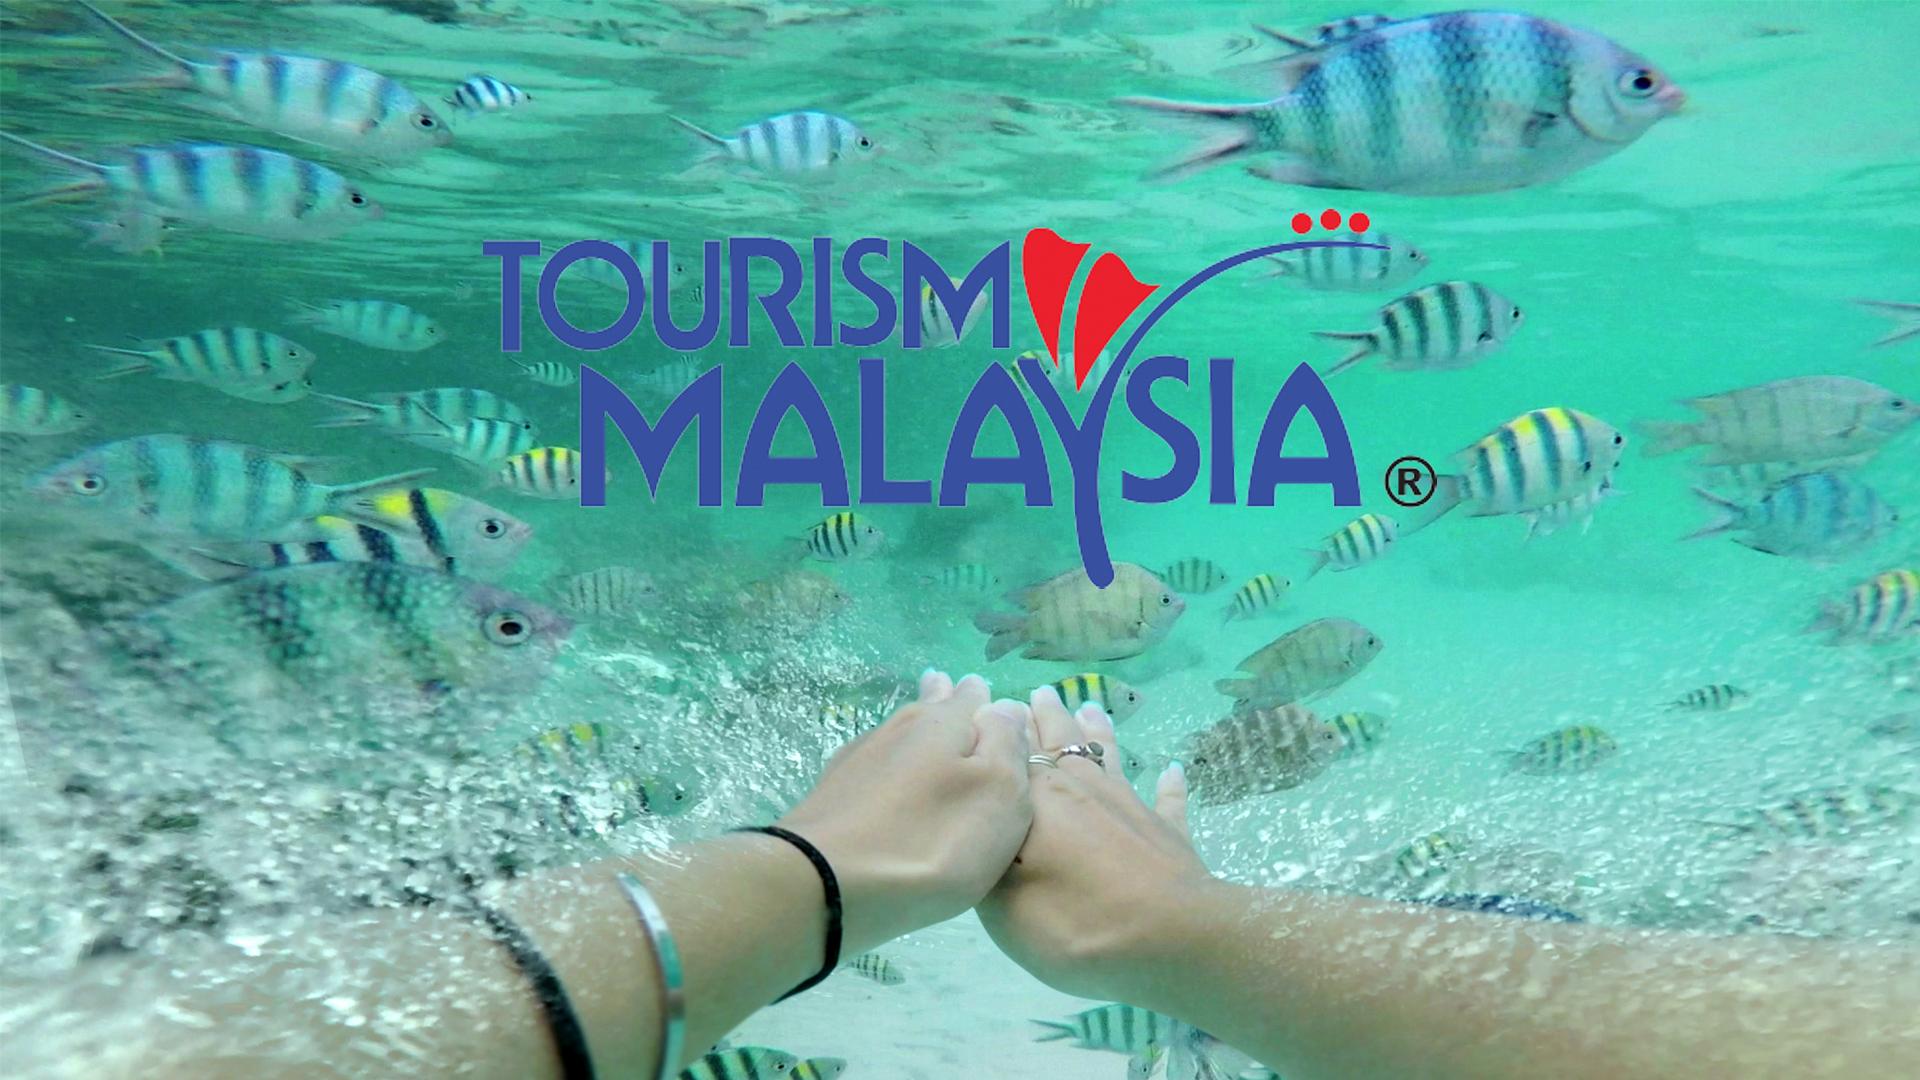 TOURISM MALAYSIA / 2017 / Campaign